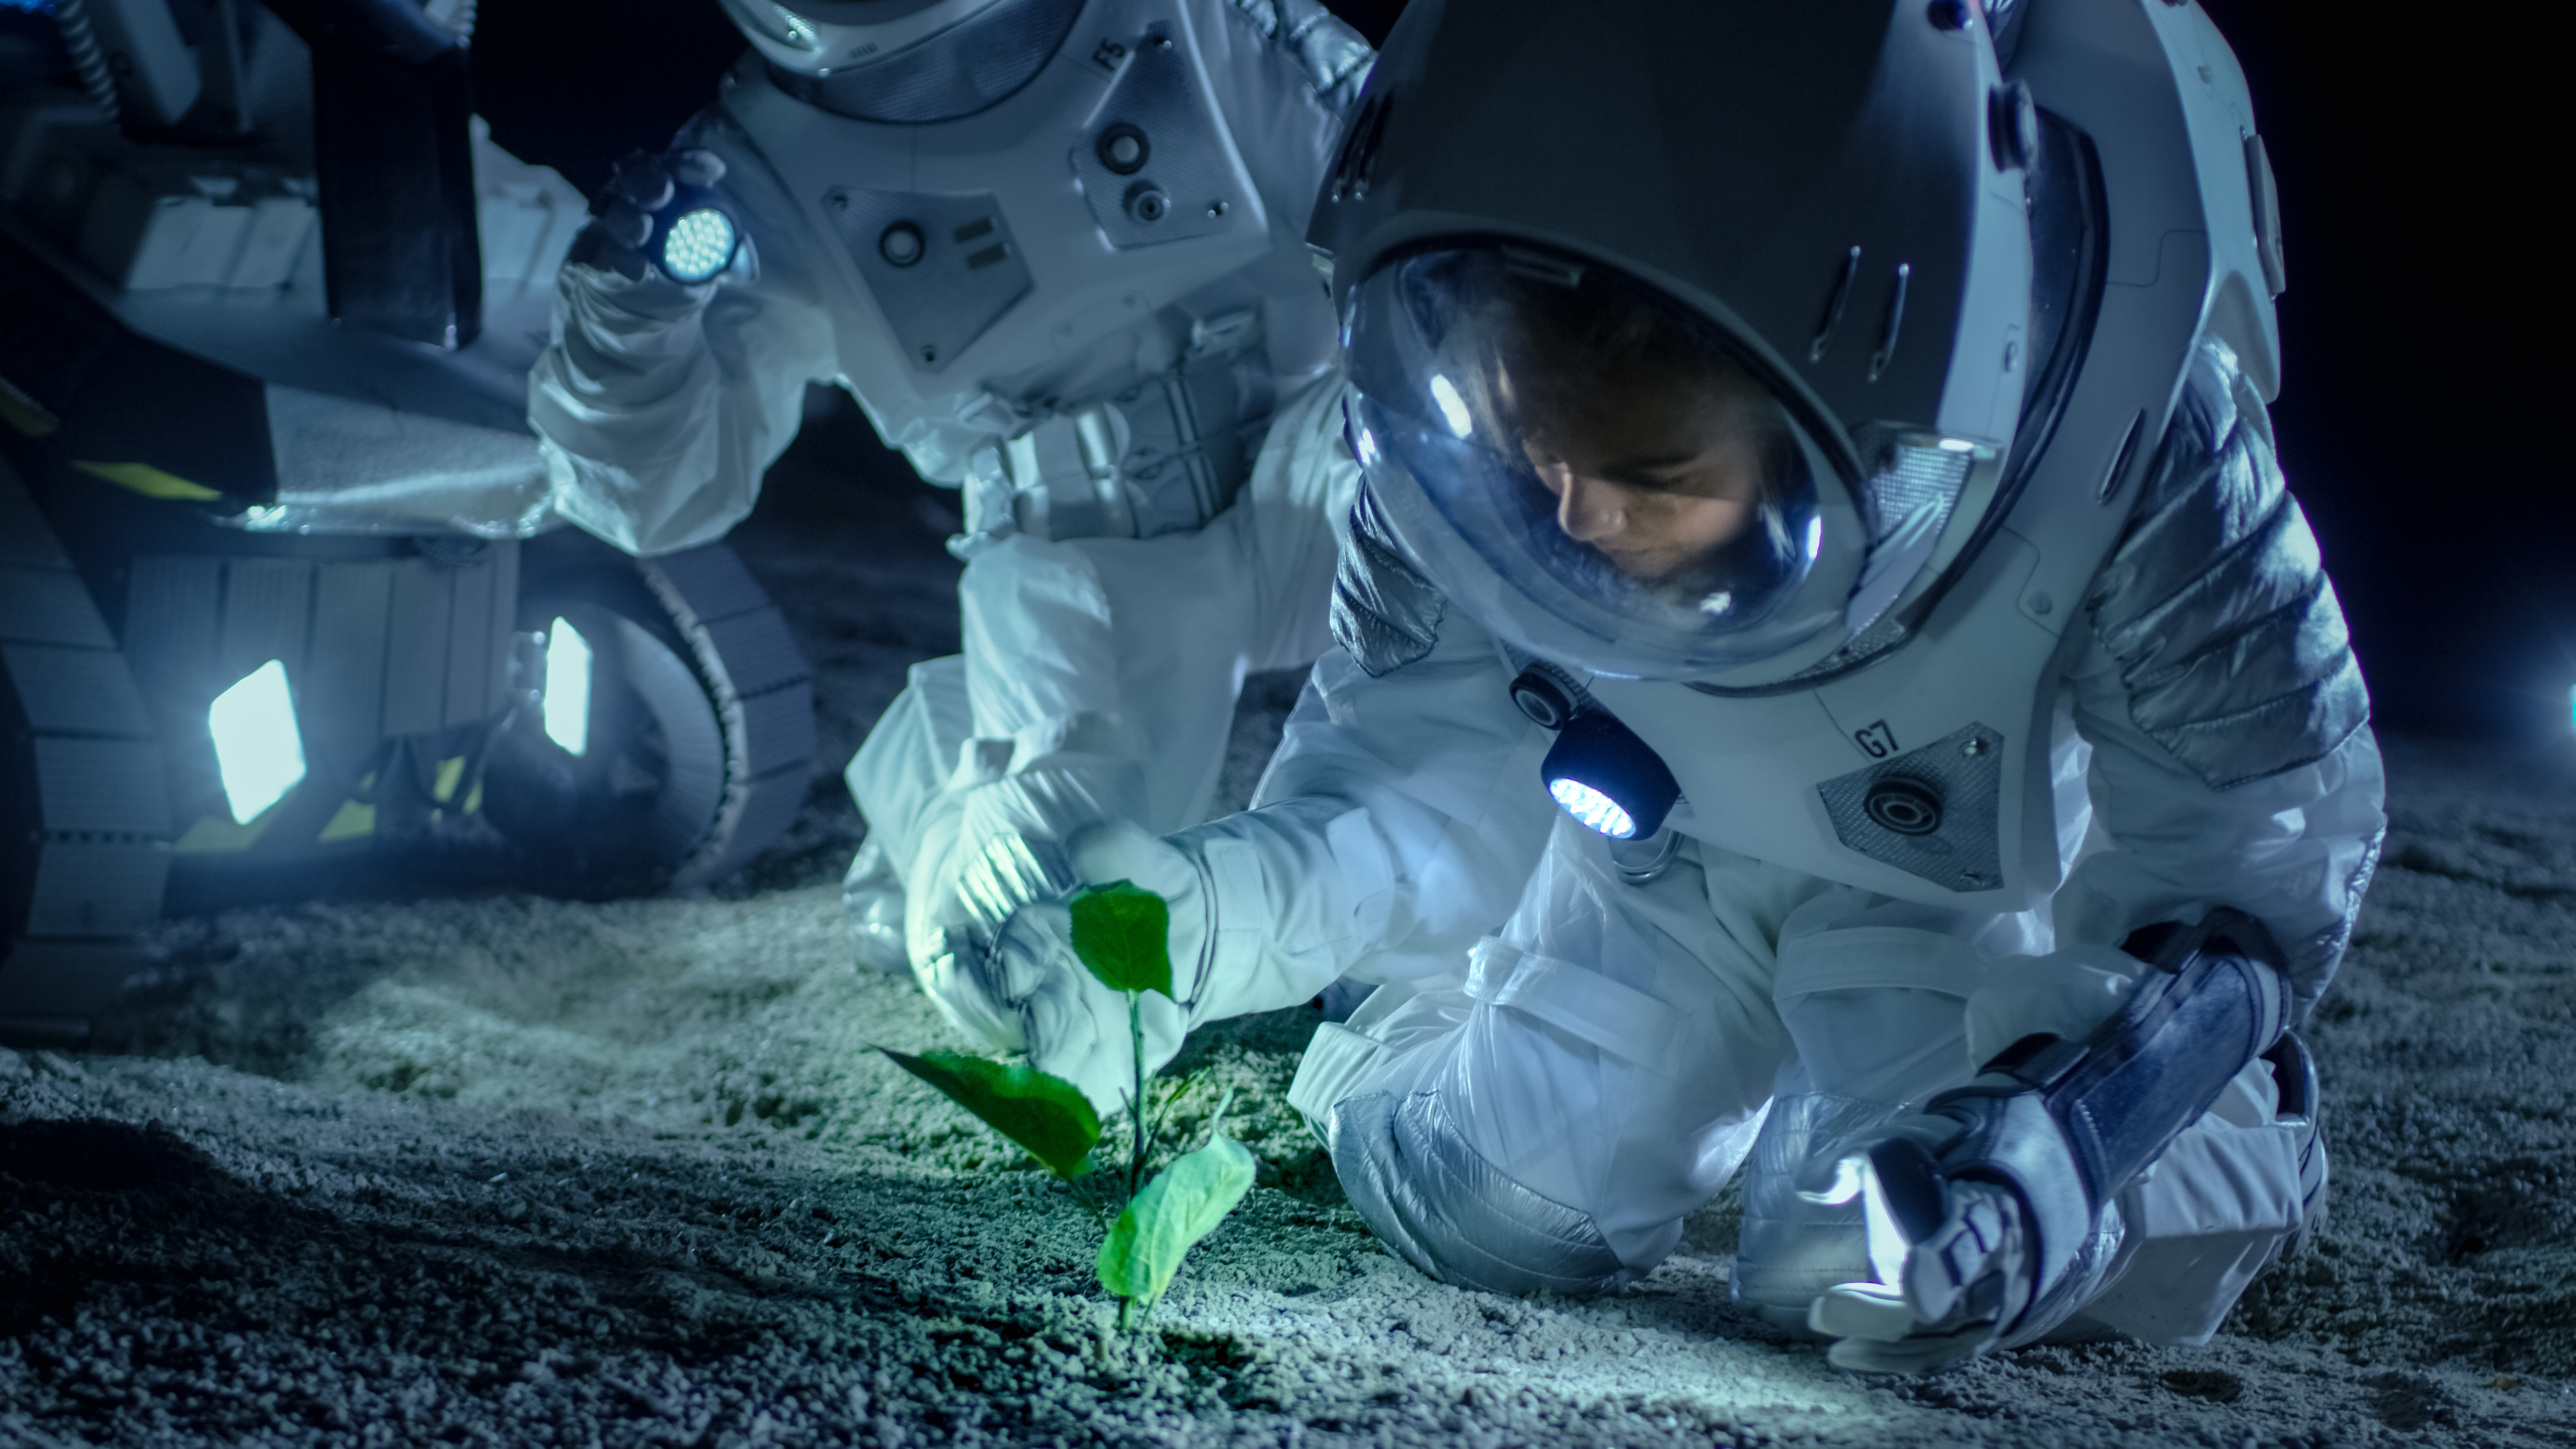 astronaut examining plant